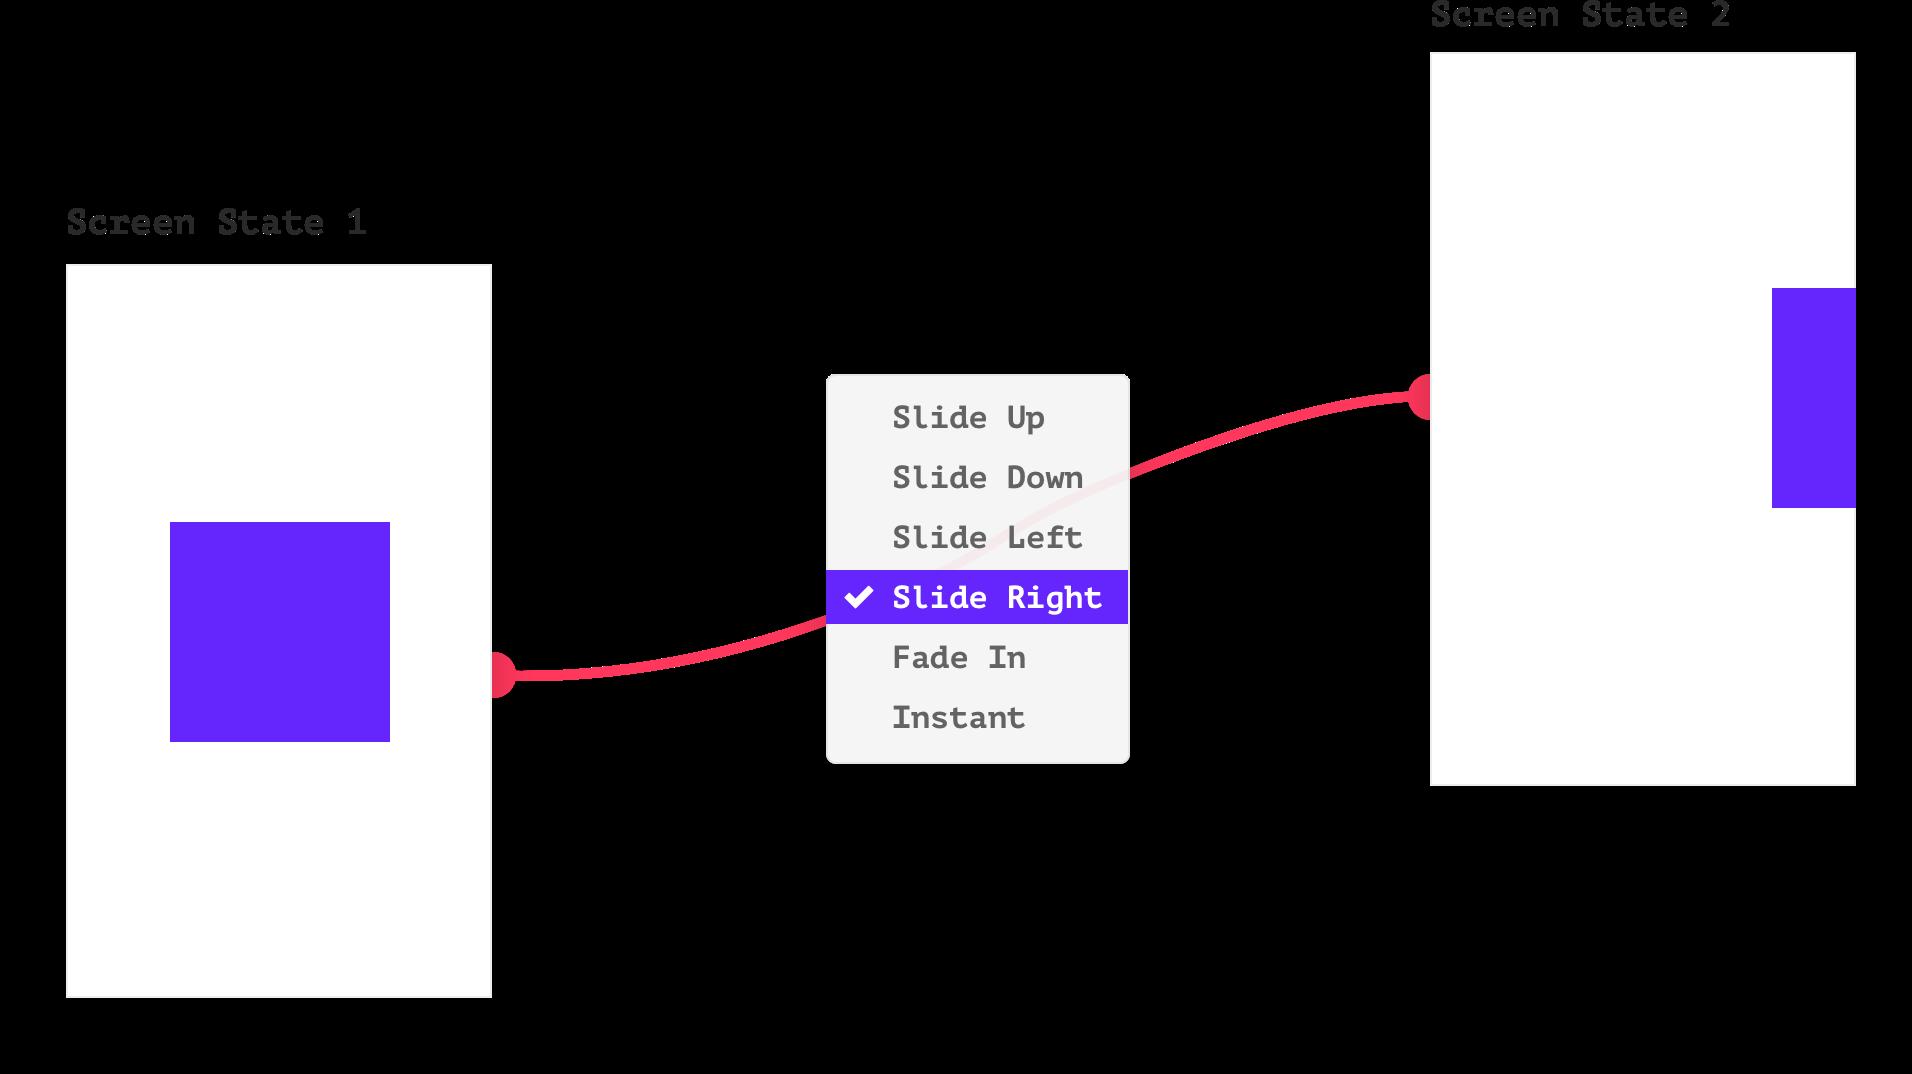 Dublicating screens - visual representation of interactions